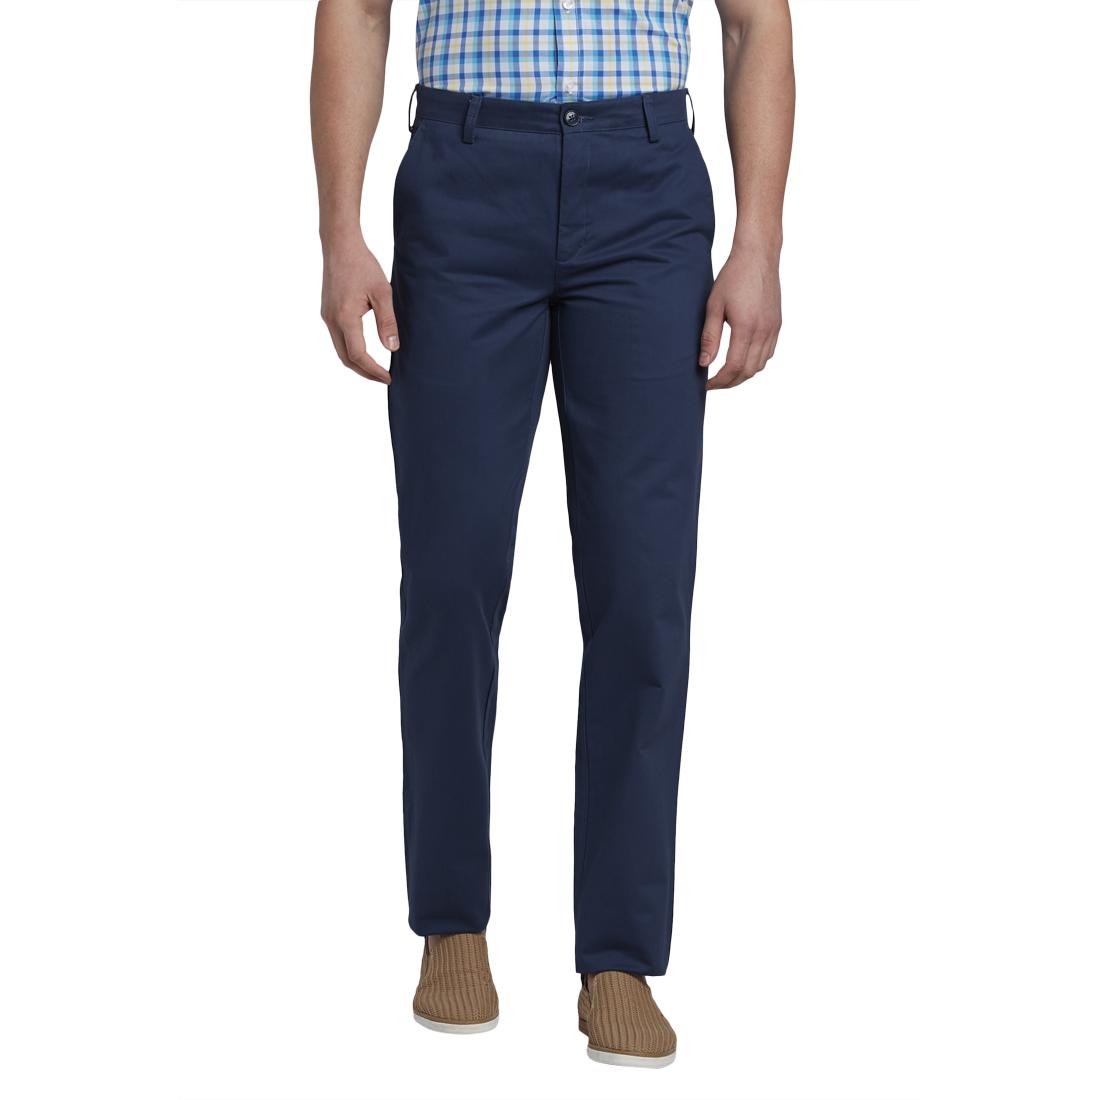 ColorPlus | ColorPlus Dark Blue Tailored Fit Trouser